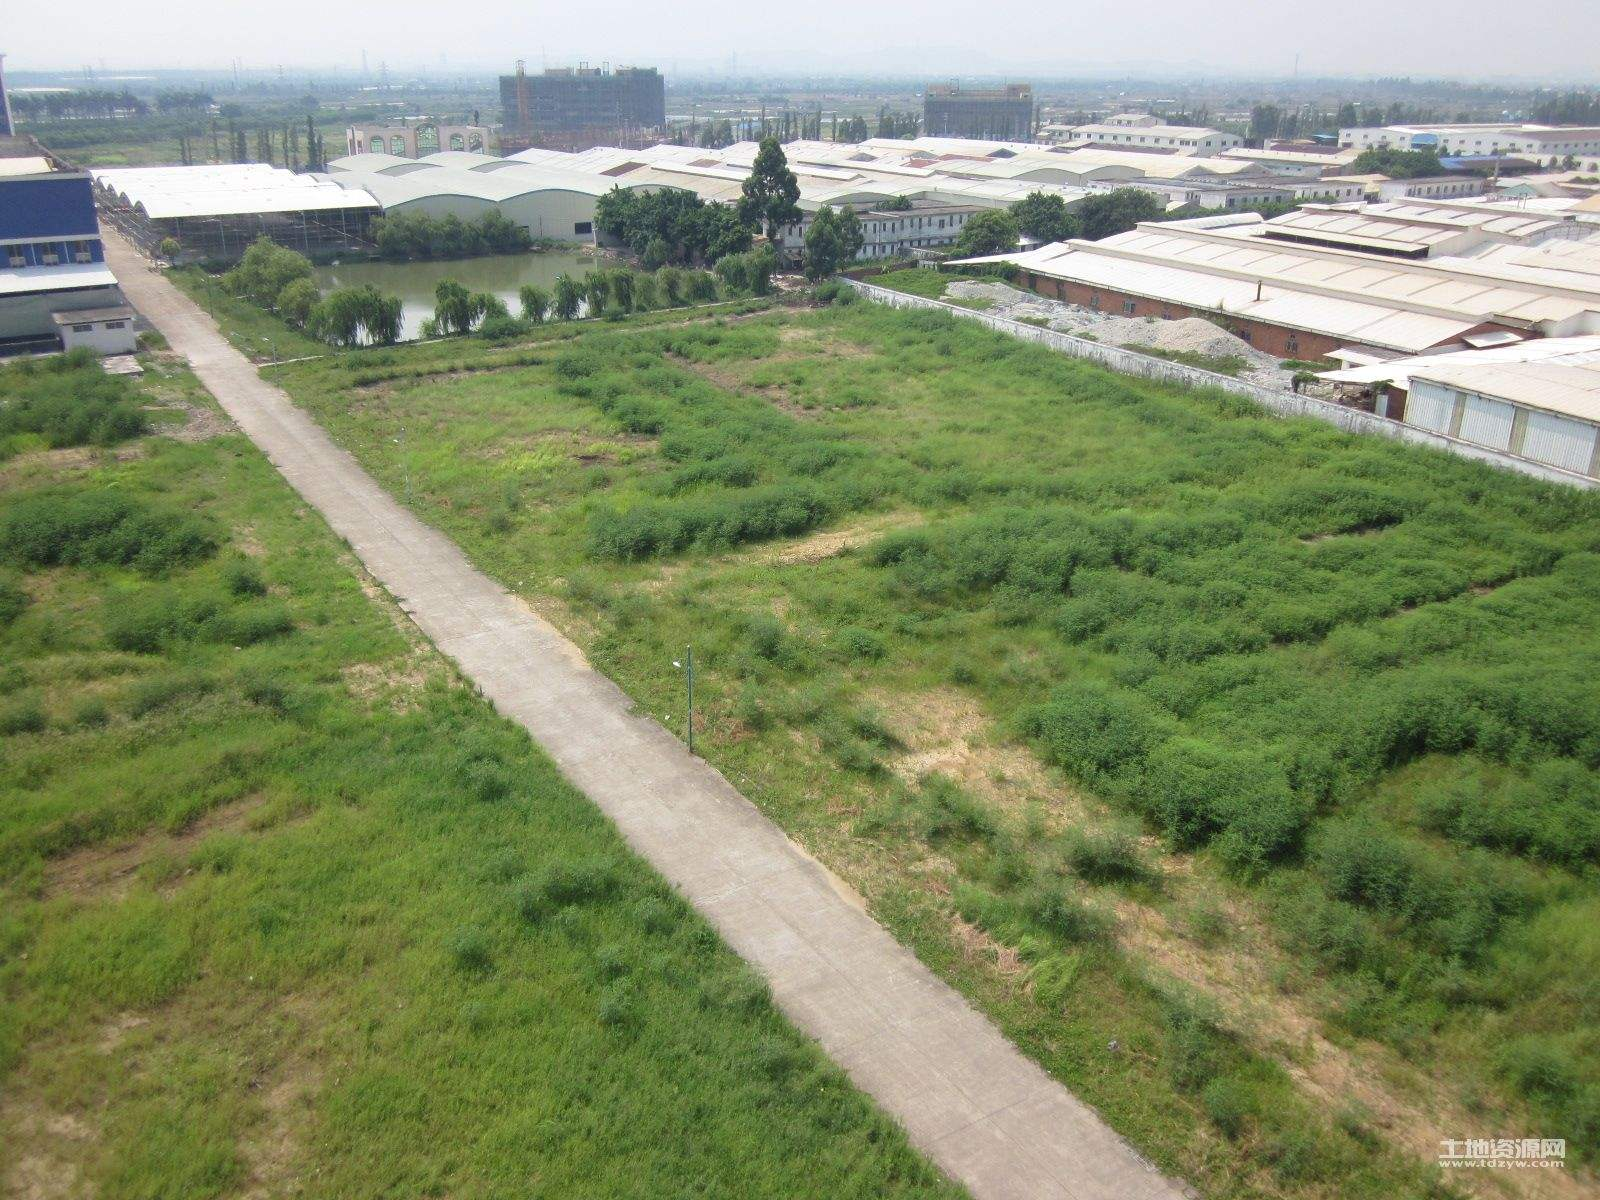 G2454无锡市中心 梁溪区扬名 近地铁 8-100亩 工业/科研用地招商 60-80万/亩 可小面积出让